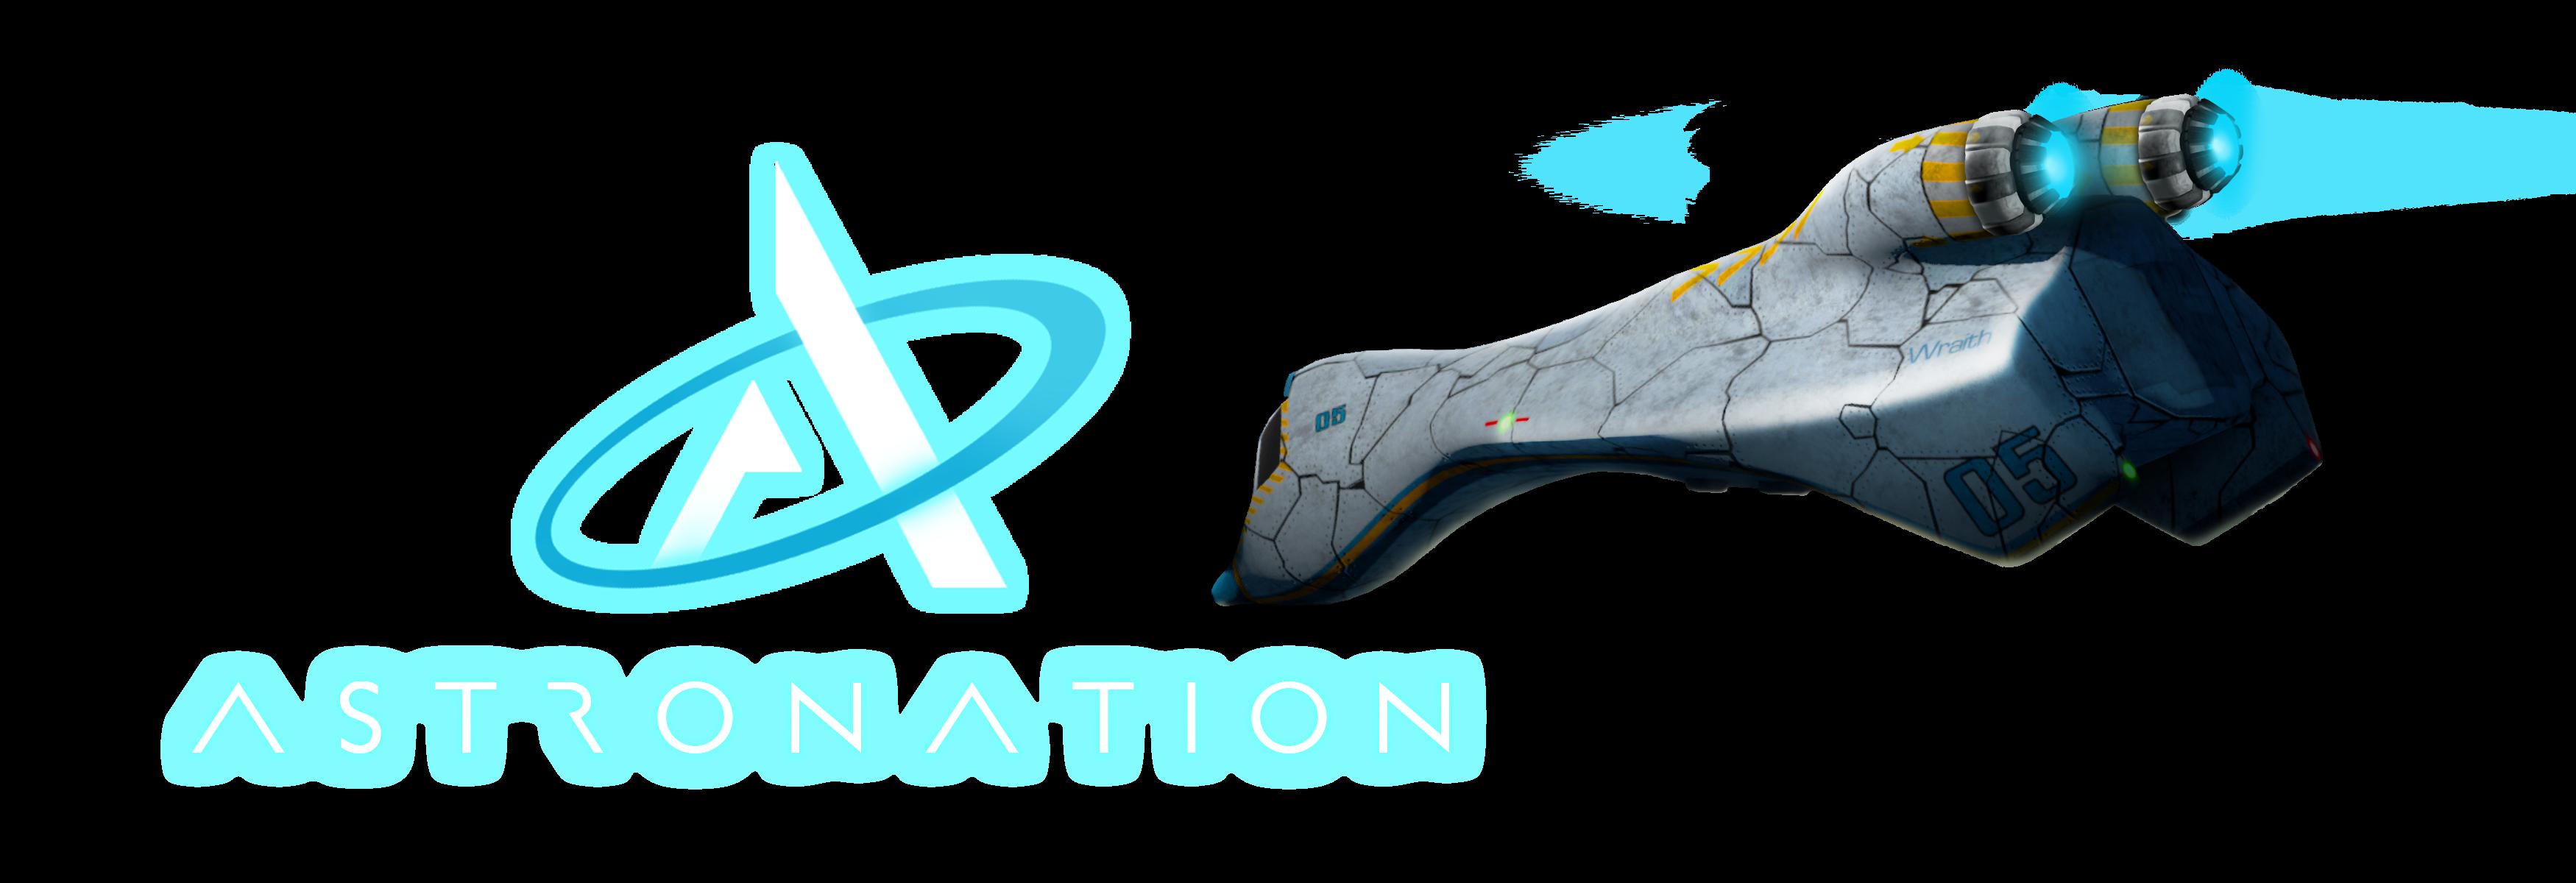 Astronation